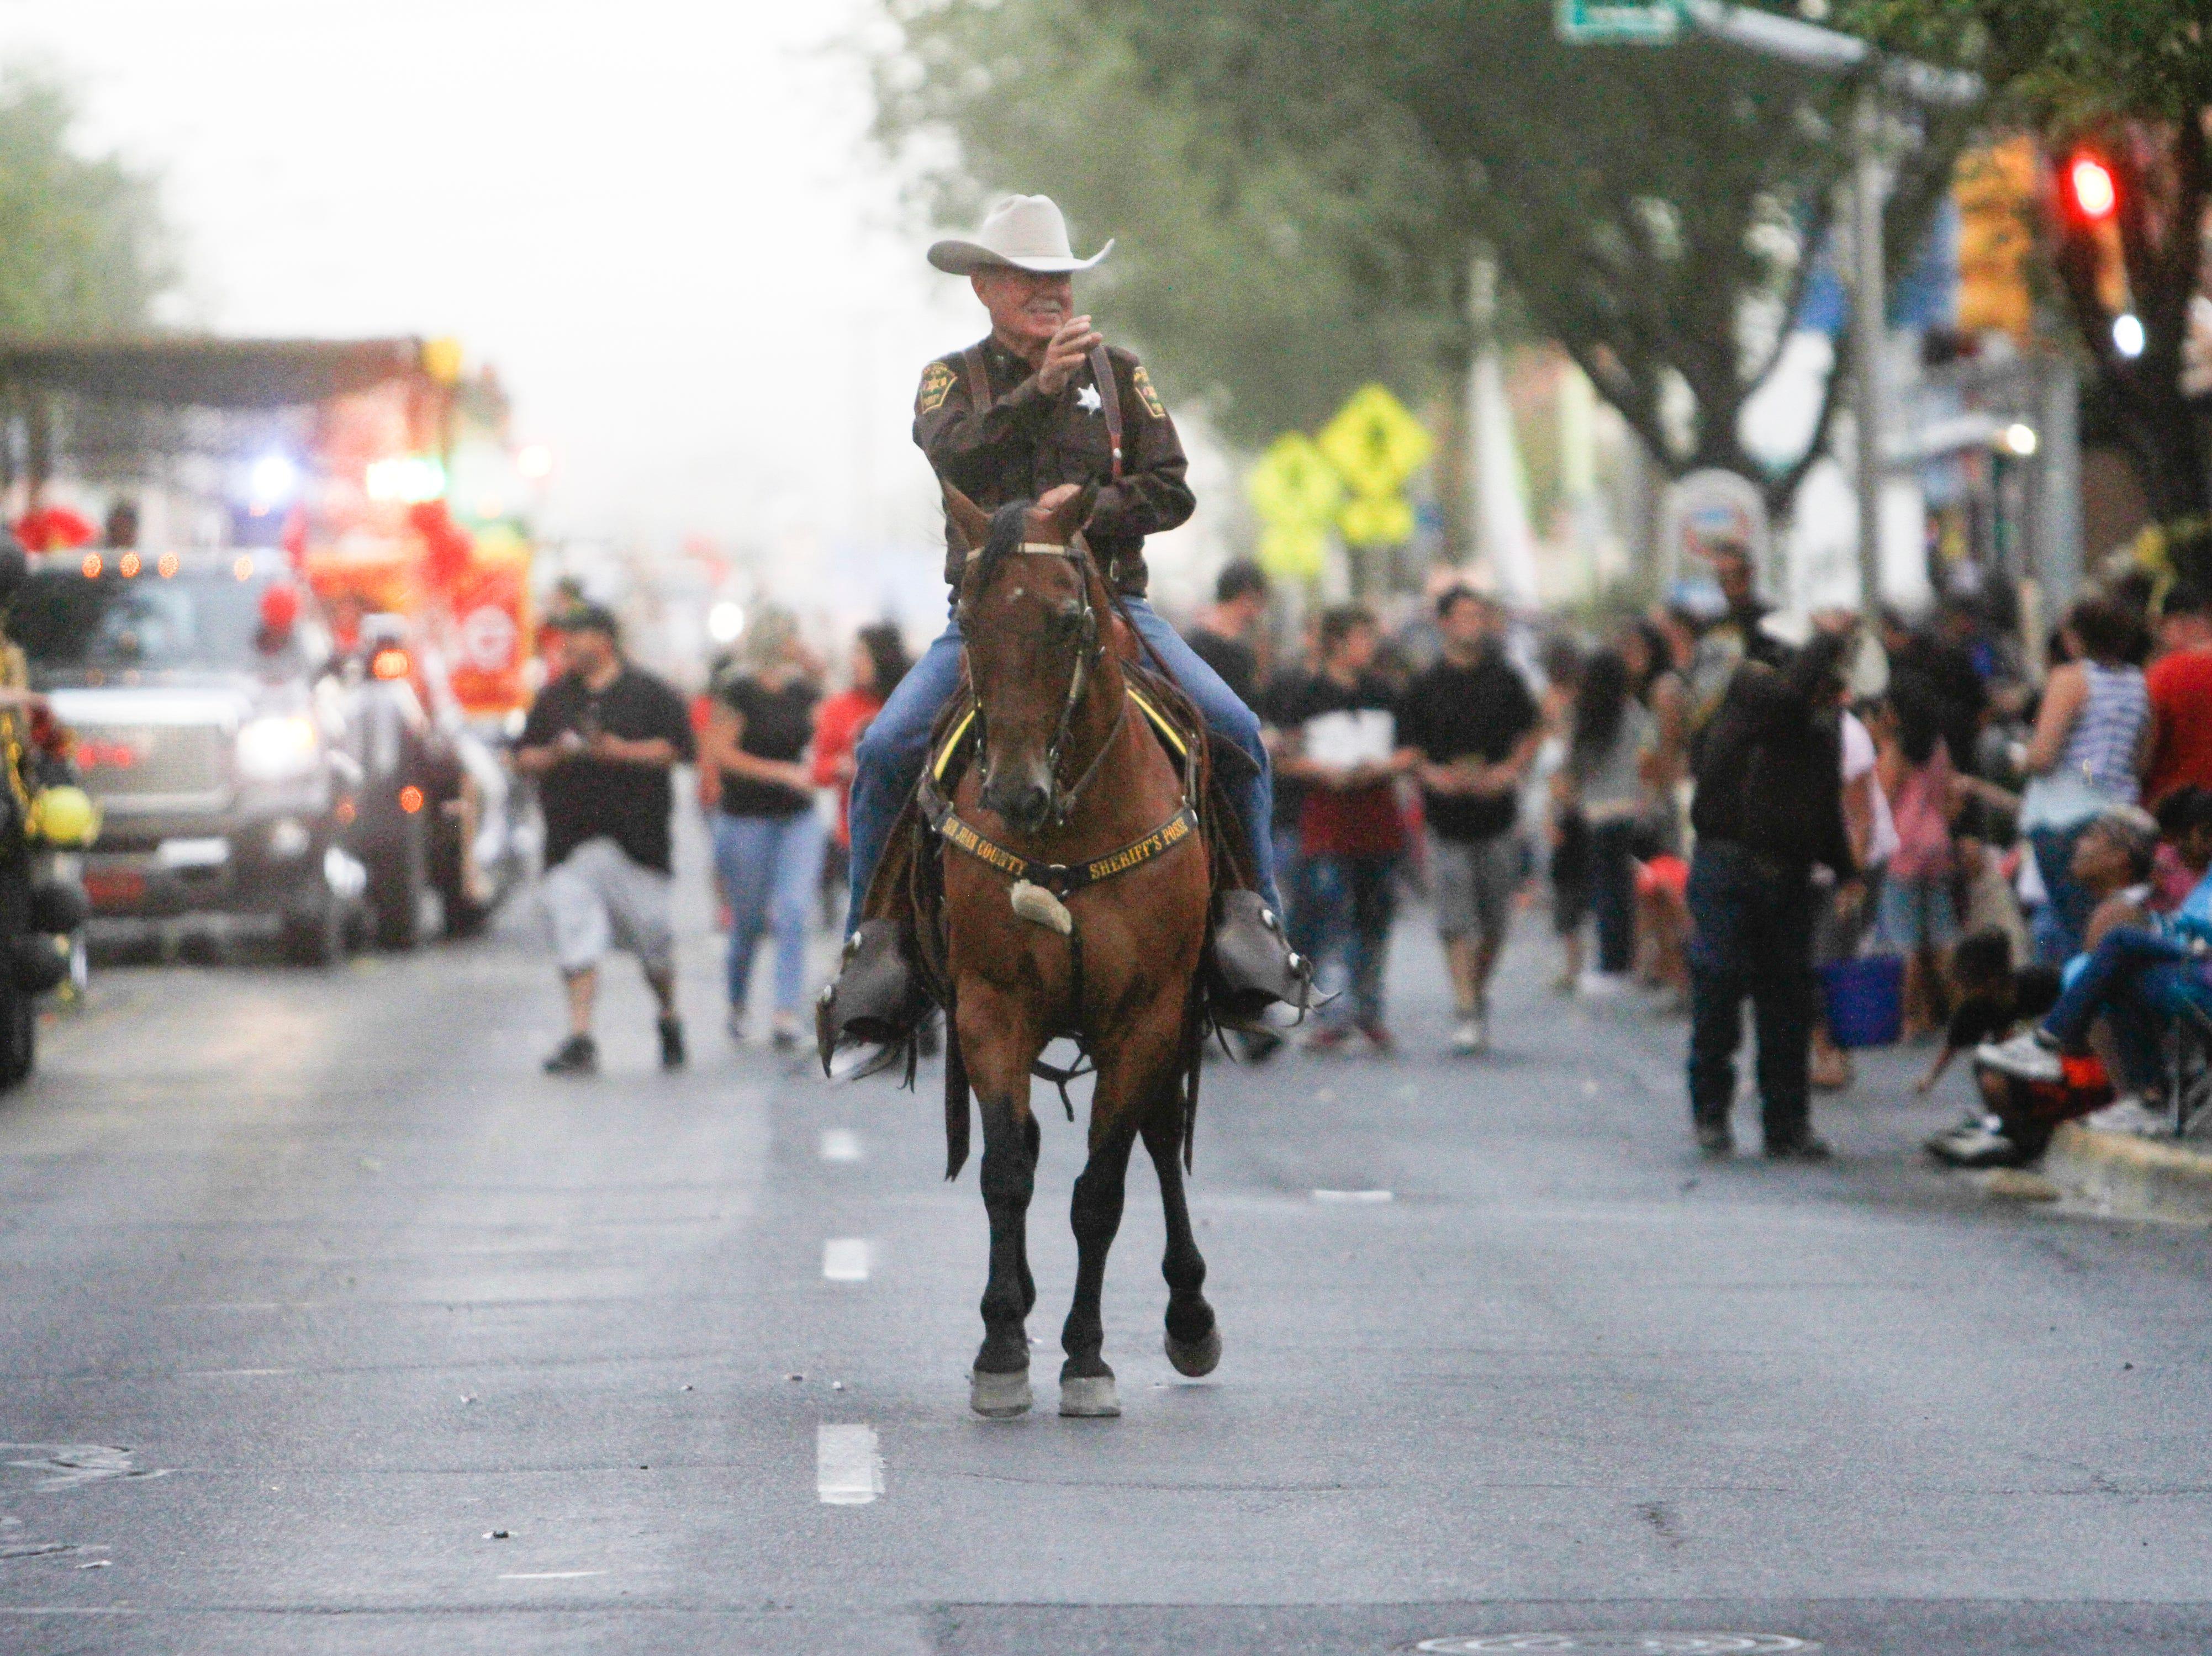 San Juan County Sheriff's Posse Capt. Dave Williams participates, Friday, Aug. 10, 2018 in the San Juan County Fair Parade on Main Street in Farmington.